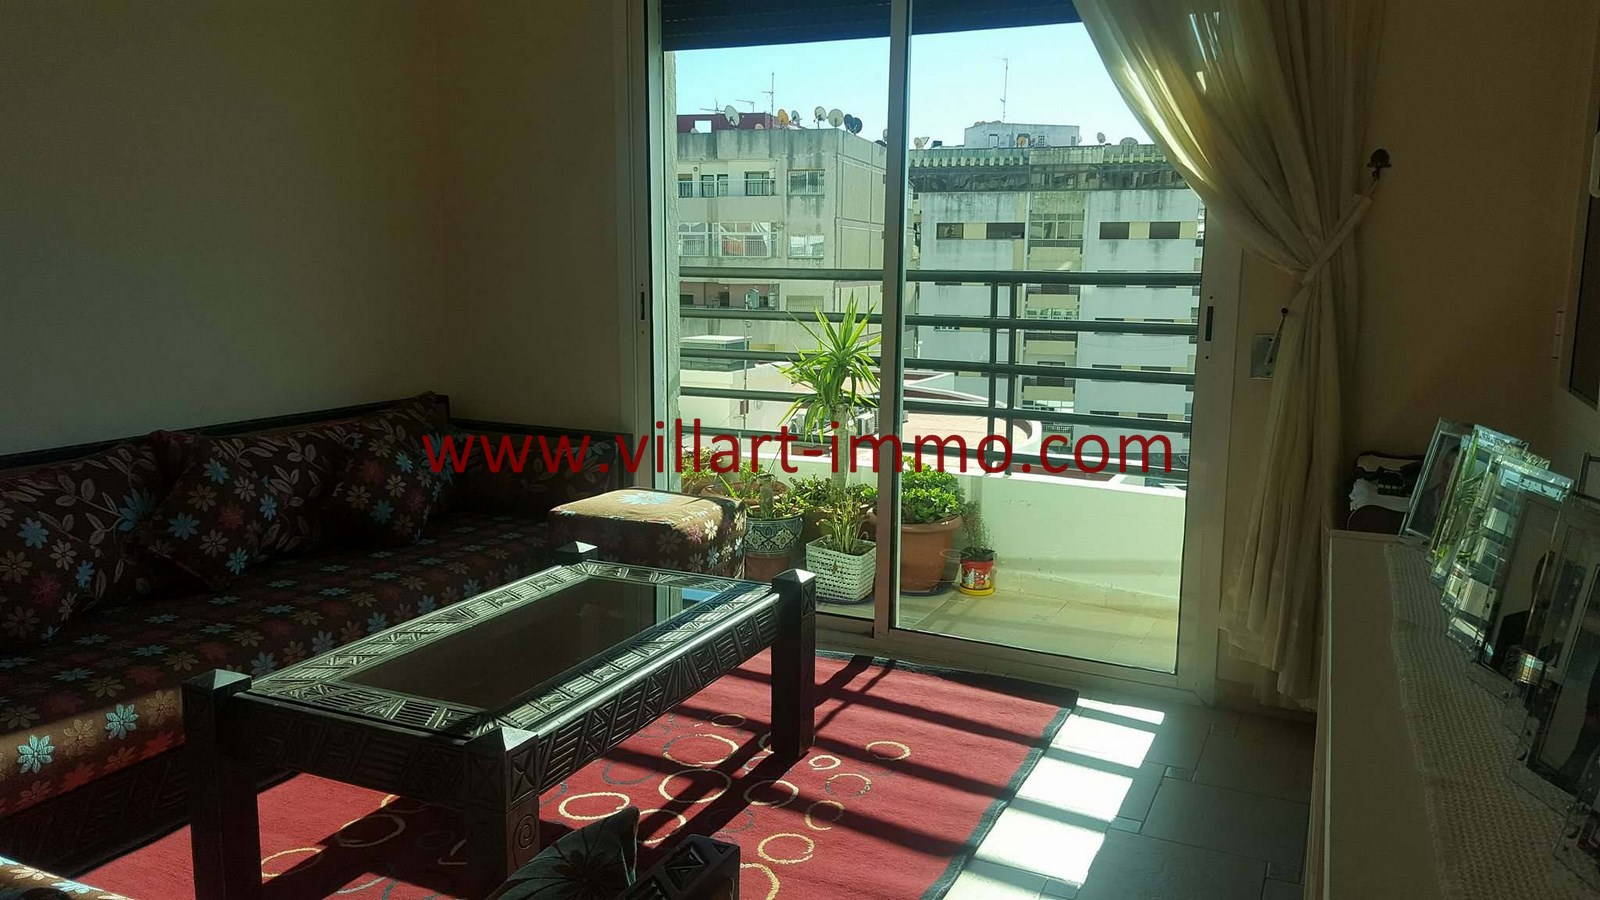 2-Vente-Appartement-Centre-ville-Tanger-Chambre 1-VA531-Villart Immo